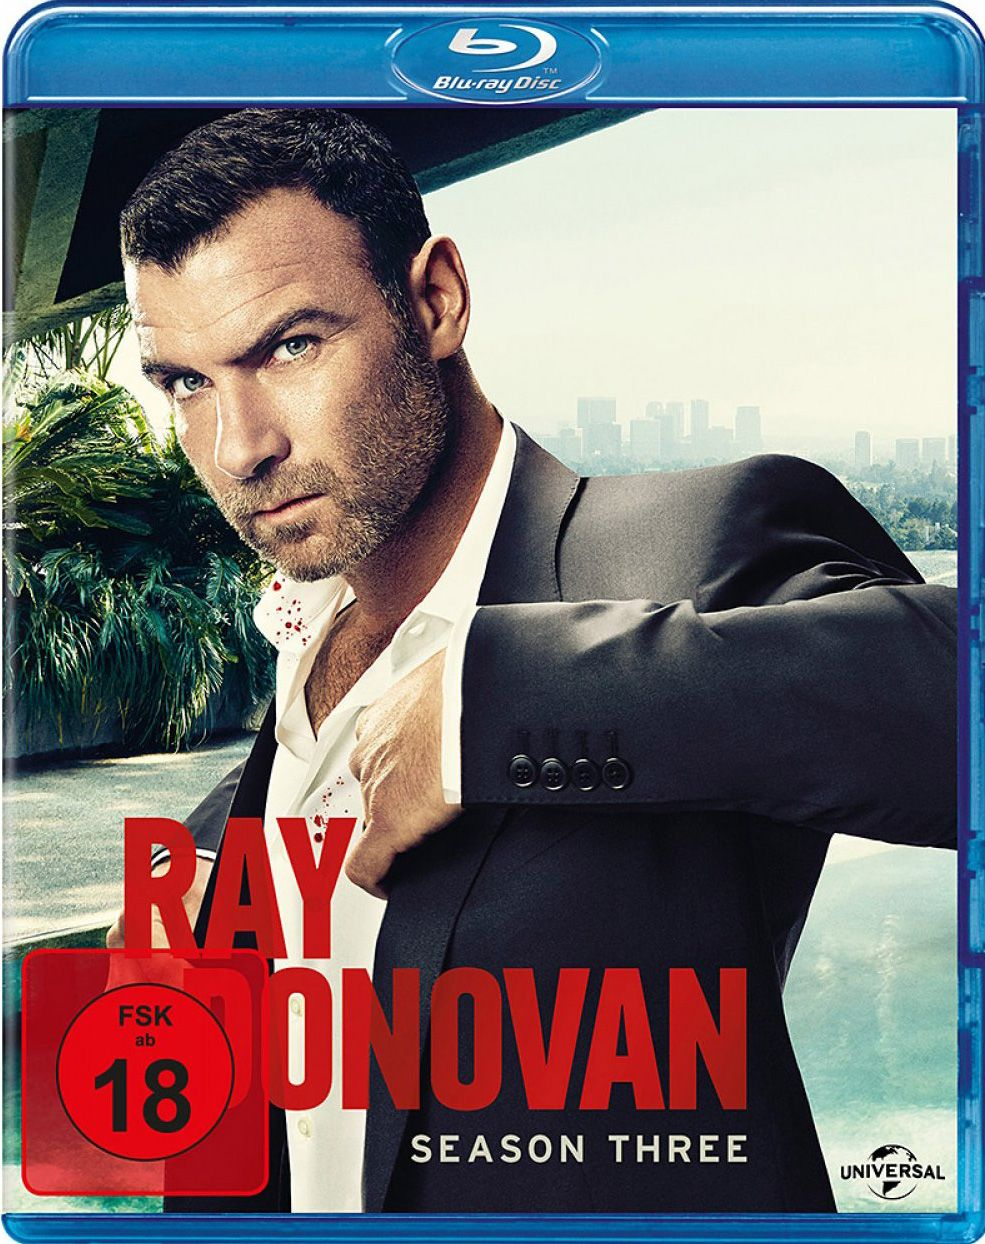 Ray Donovan - Season 3 (4 Discs) (BLURAY)